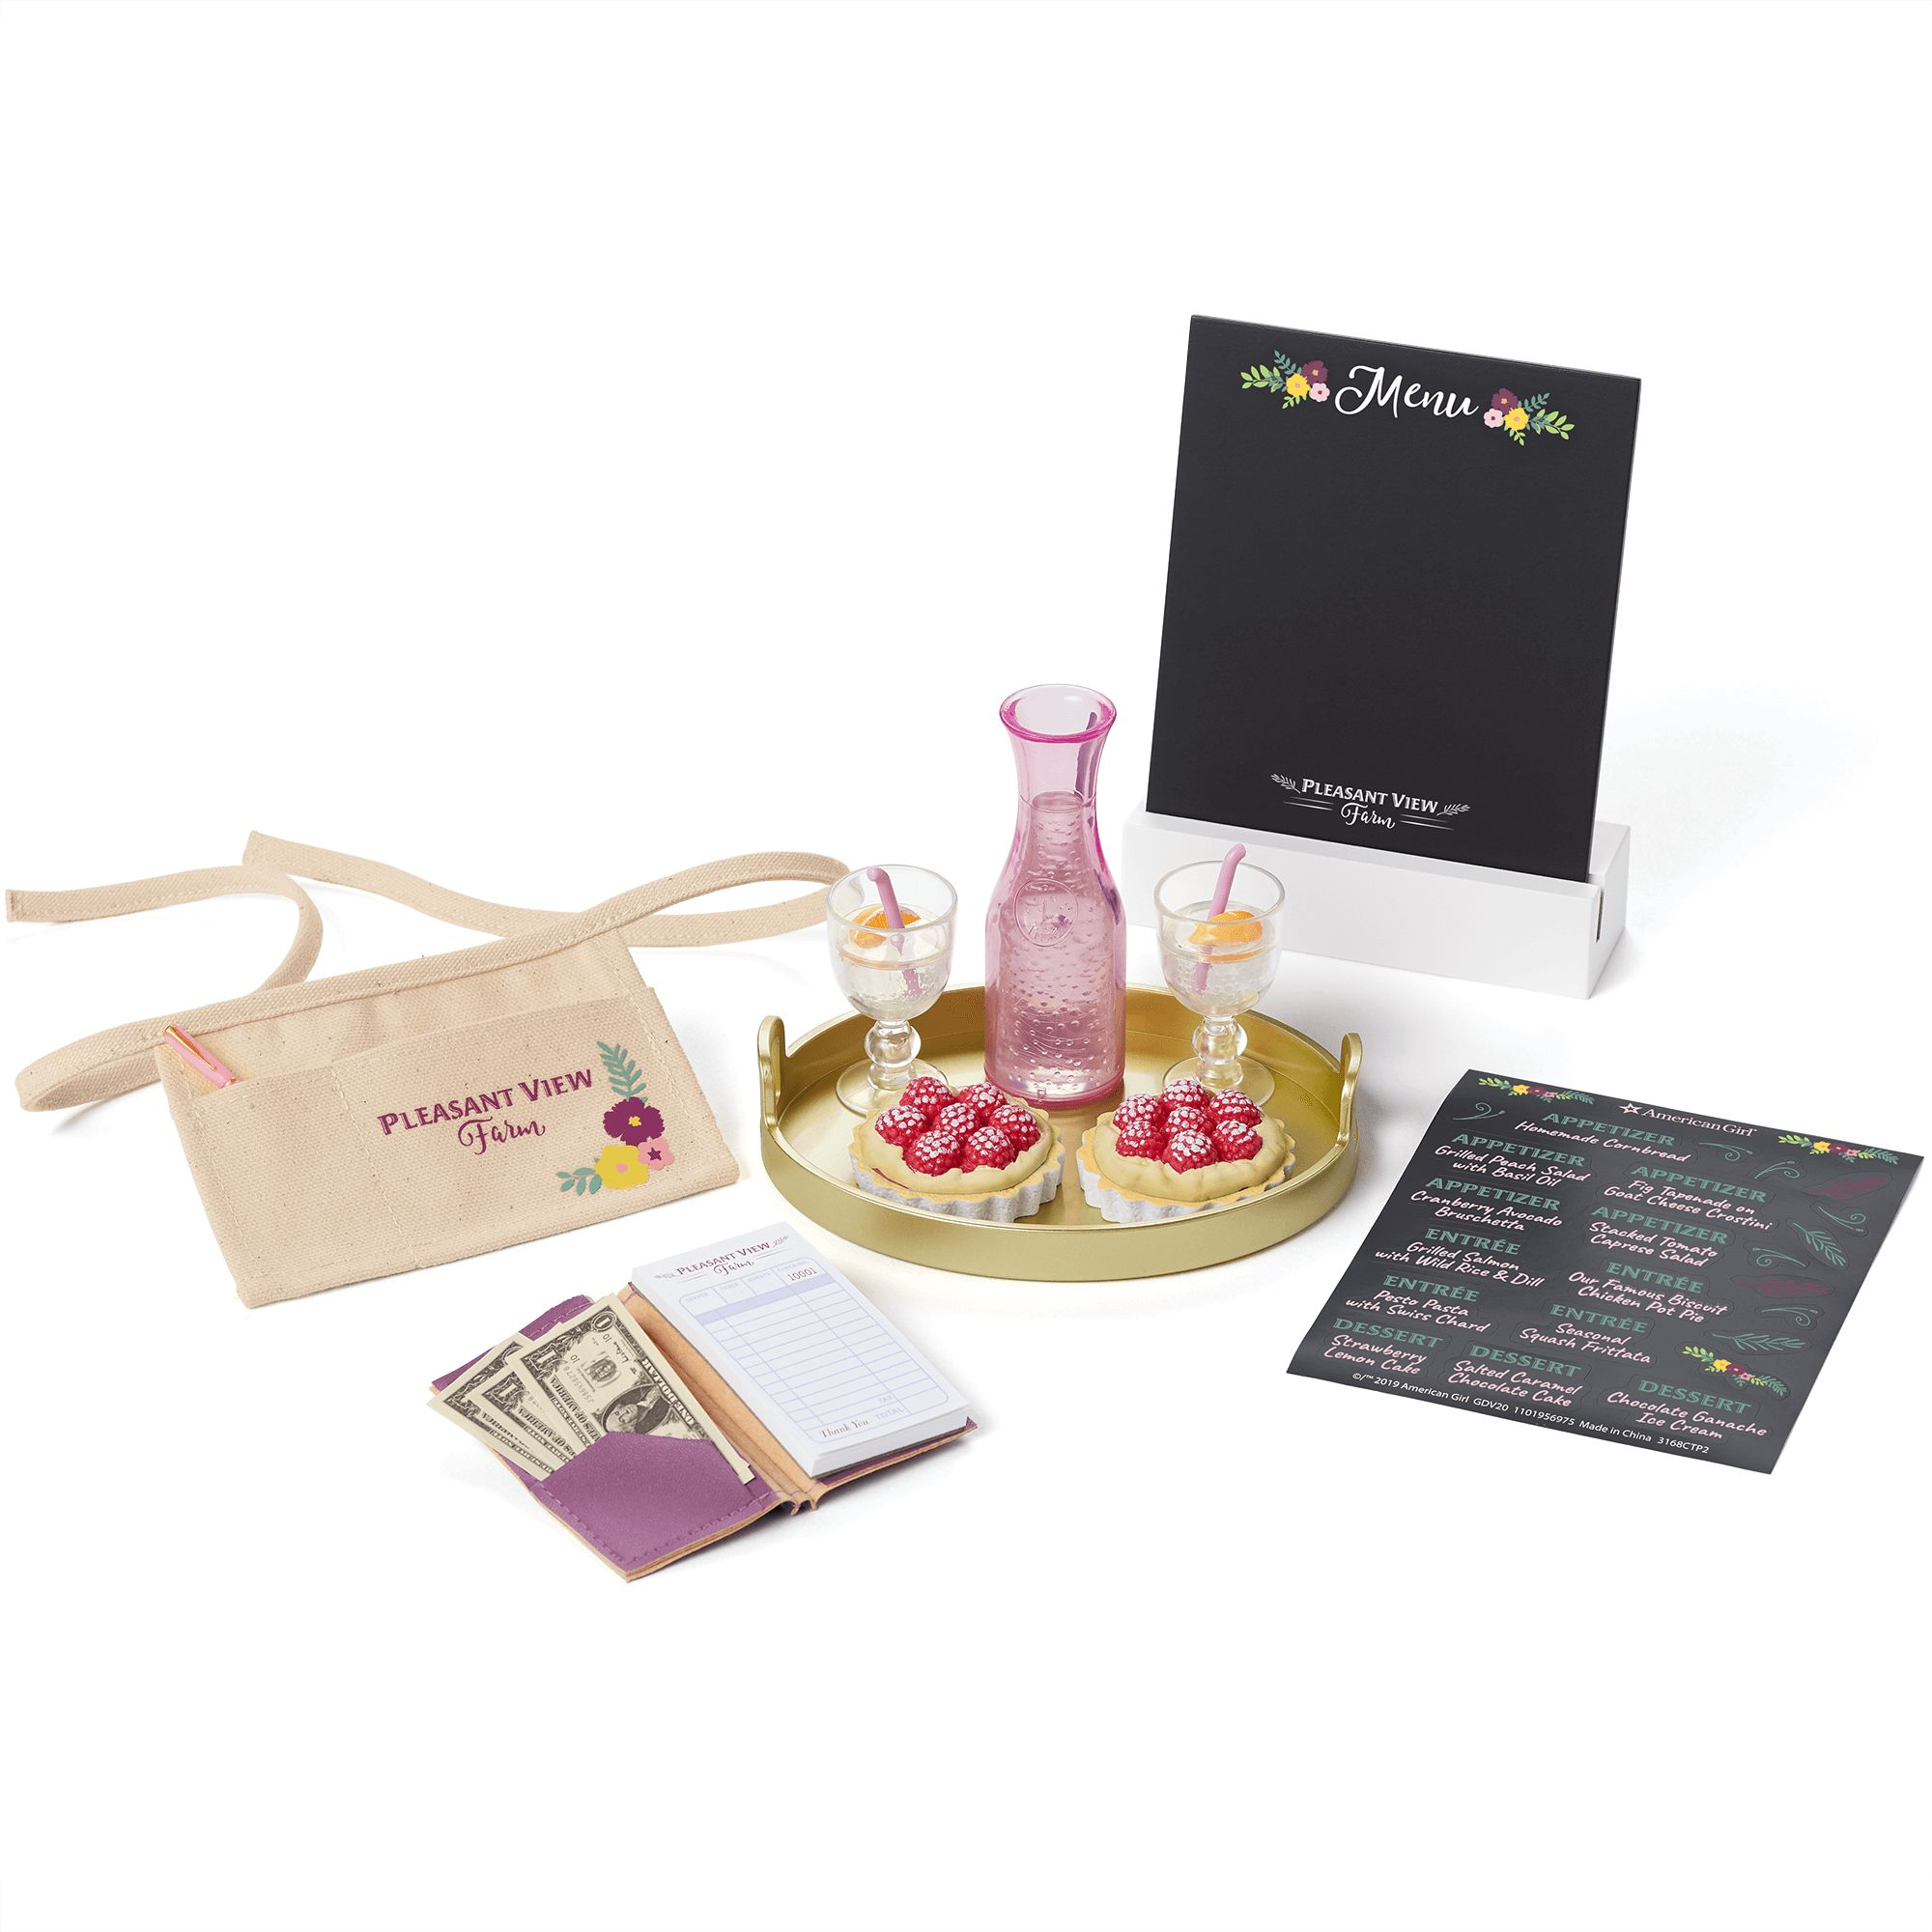 Blaire's Restaurant Accessories